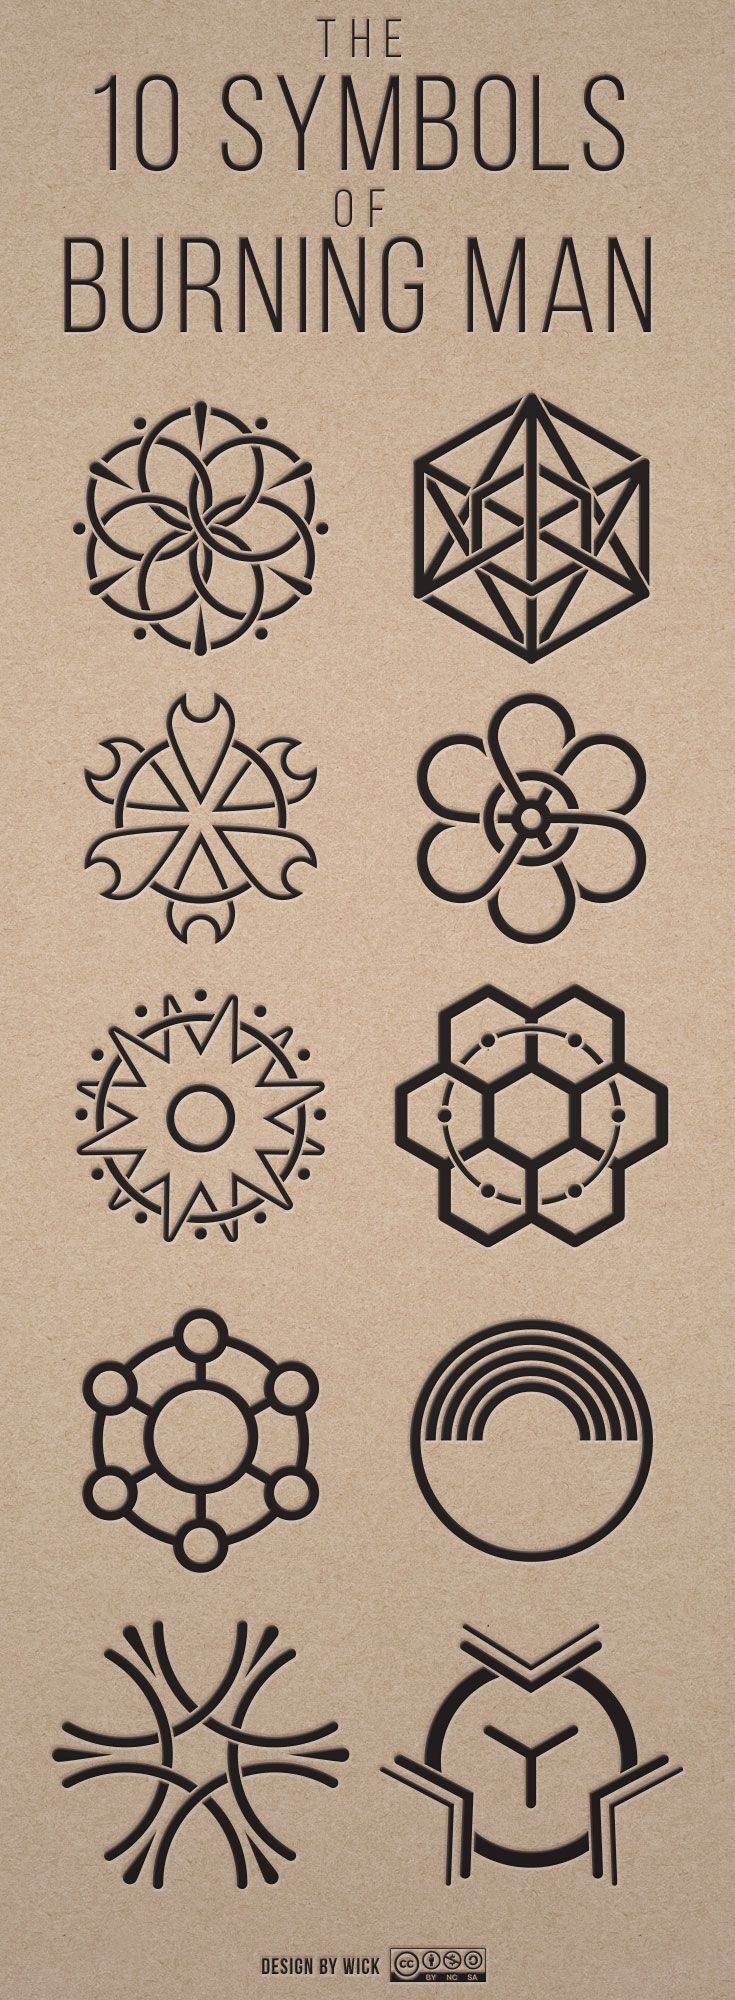 The 10 principles of Burning Man illustrated in symbols - by Wick.   tatuajes | Spanish tatuajes  |tatuajes para mujeres | tatuajes para hombres  | diseños de tatuajes http://amzn.to/28PQlav